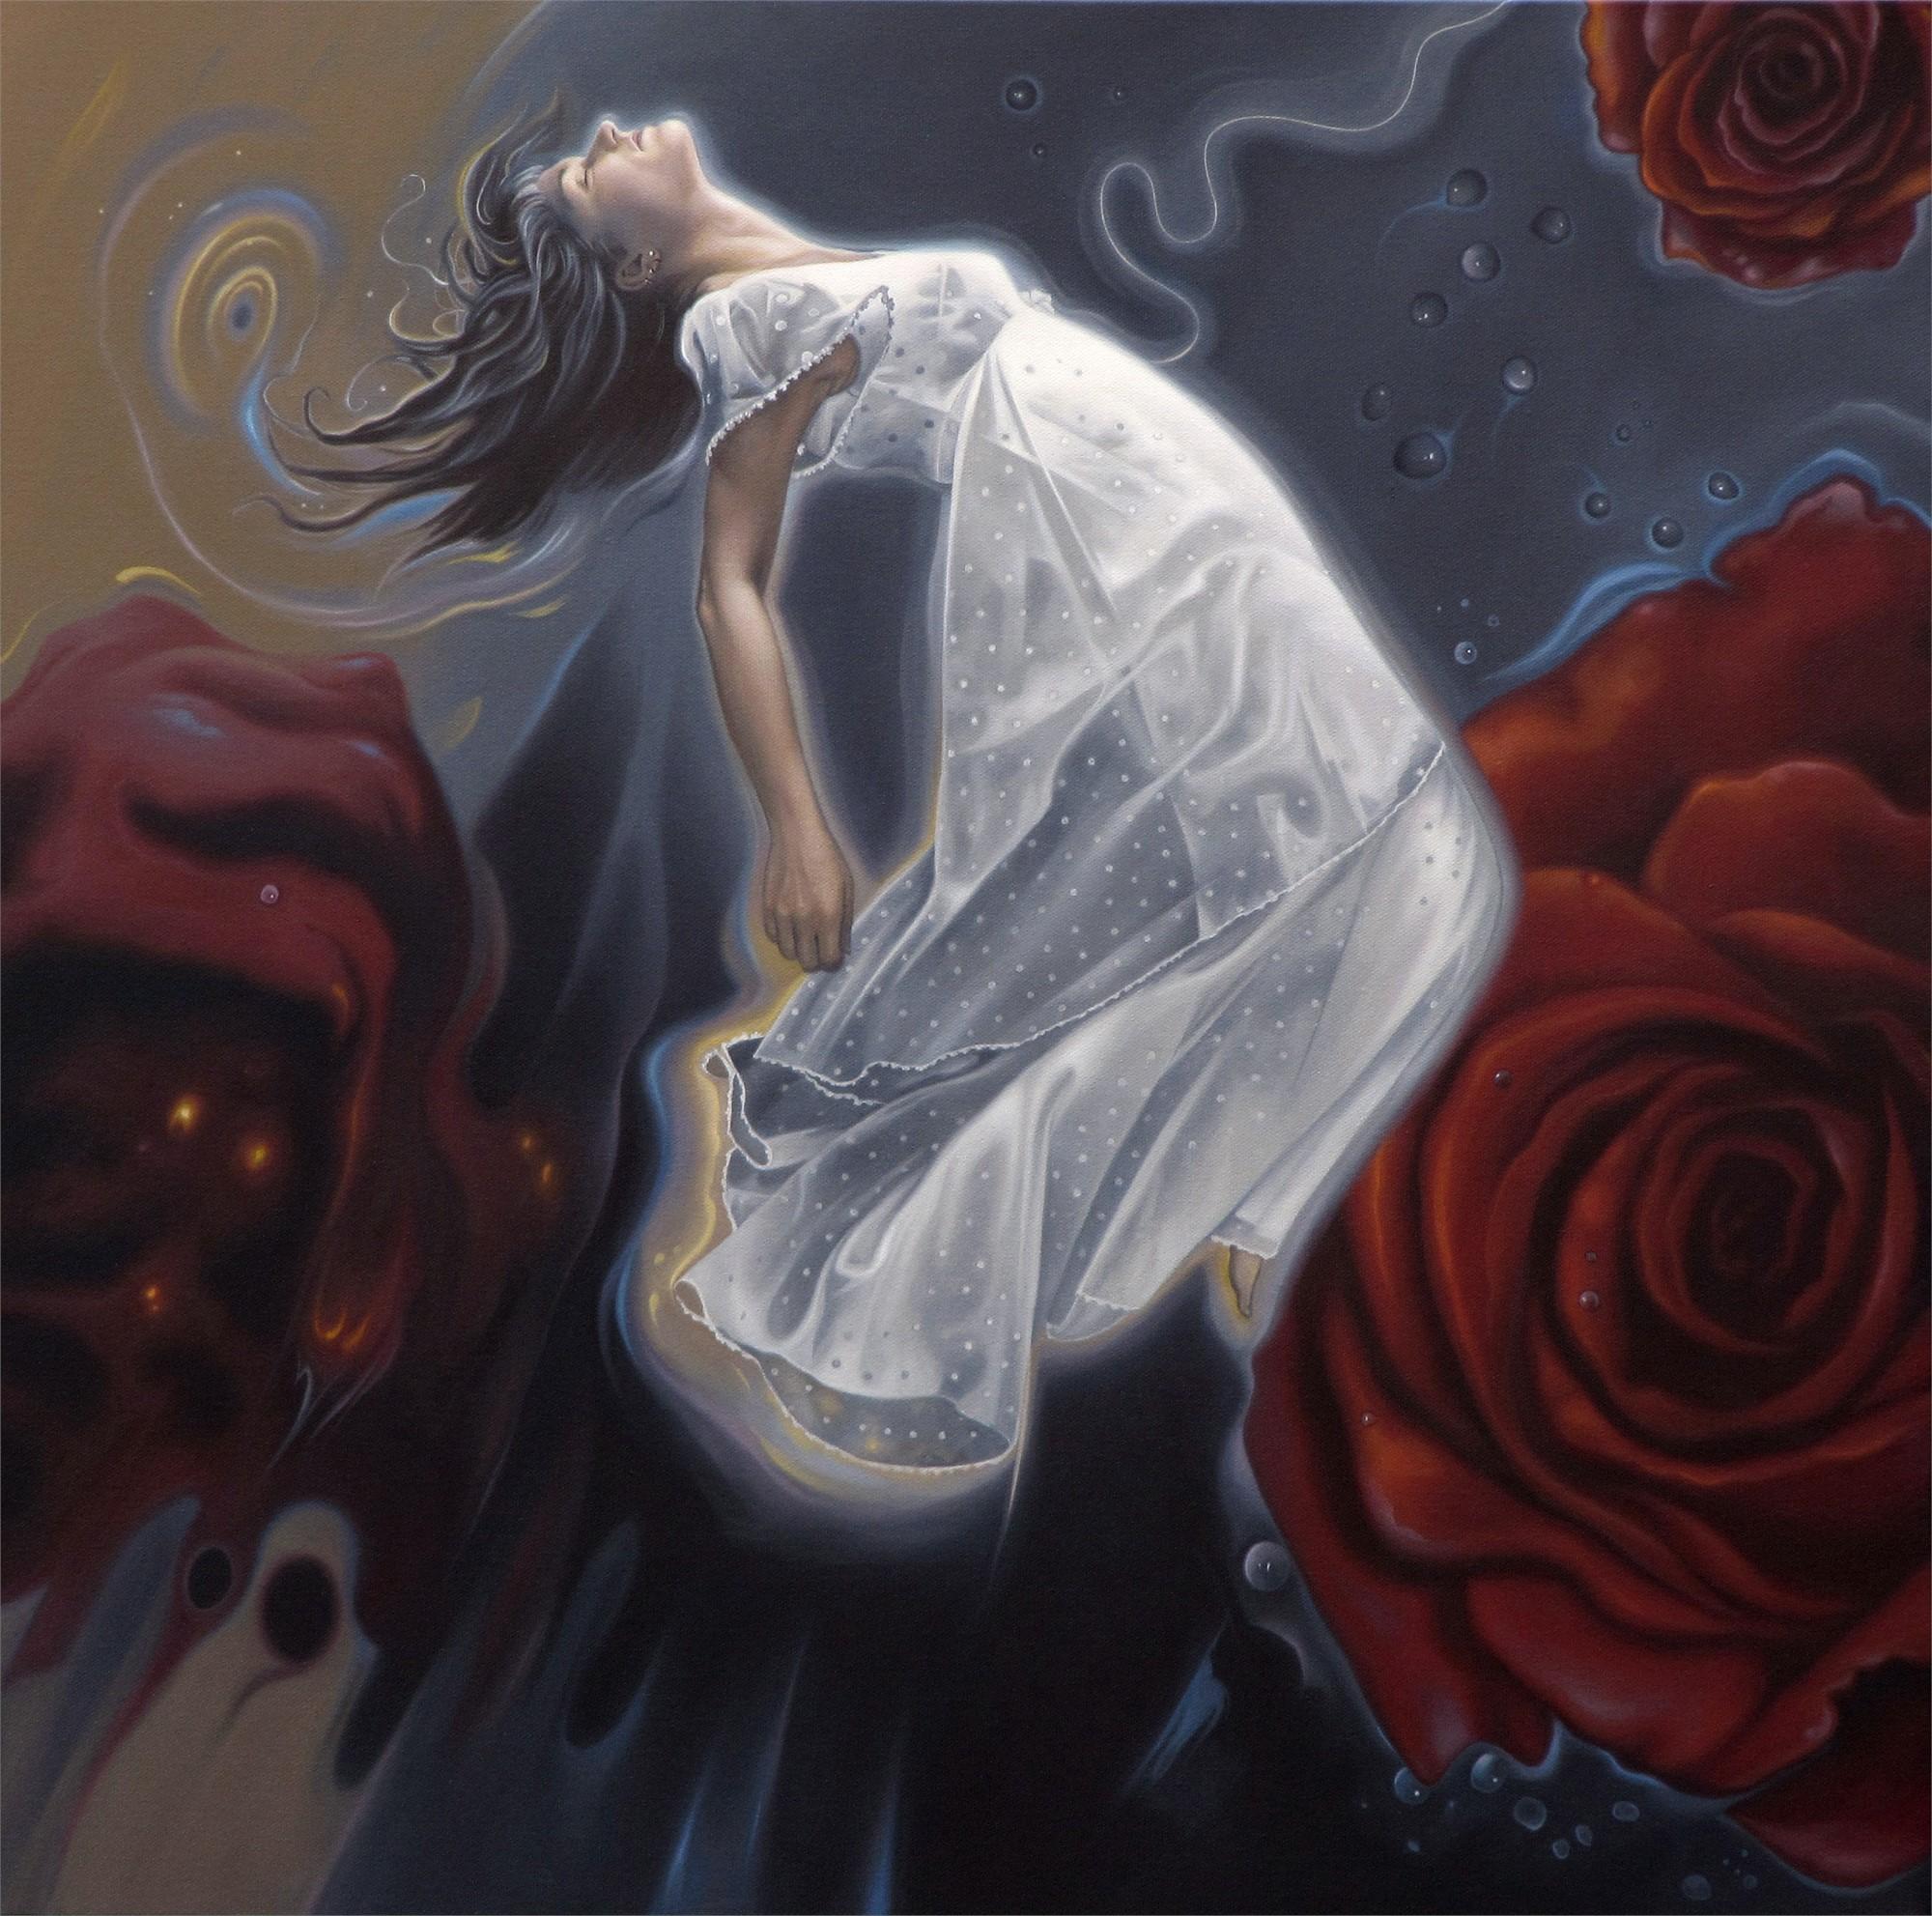 Amnesia by Sybiline